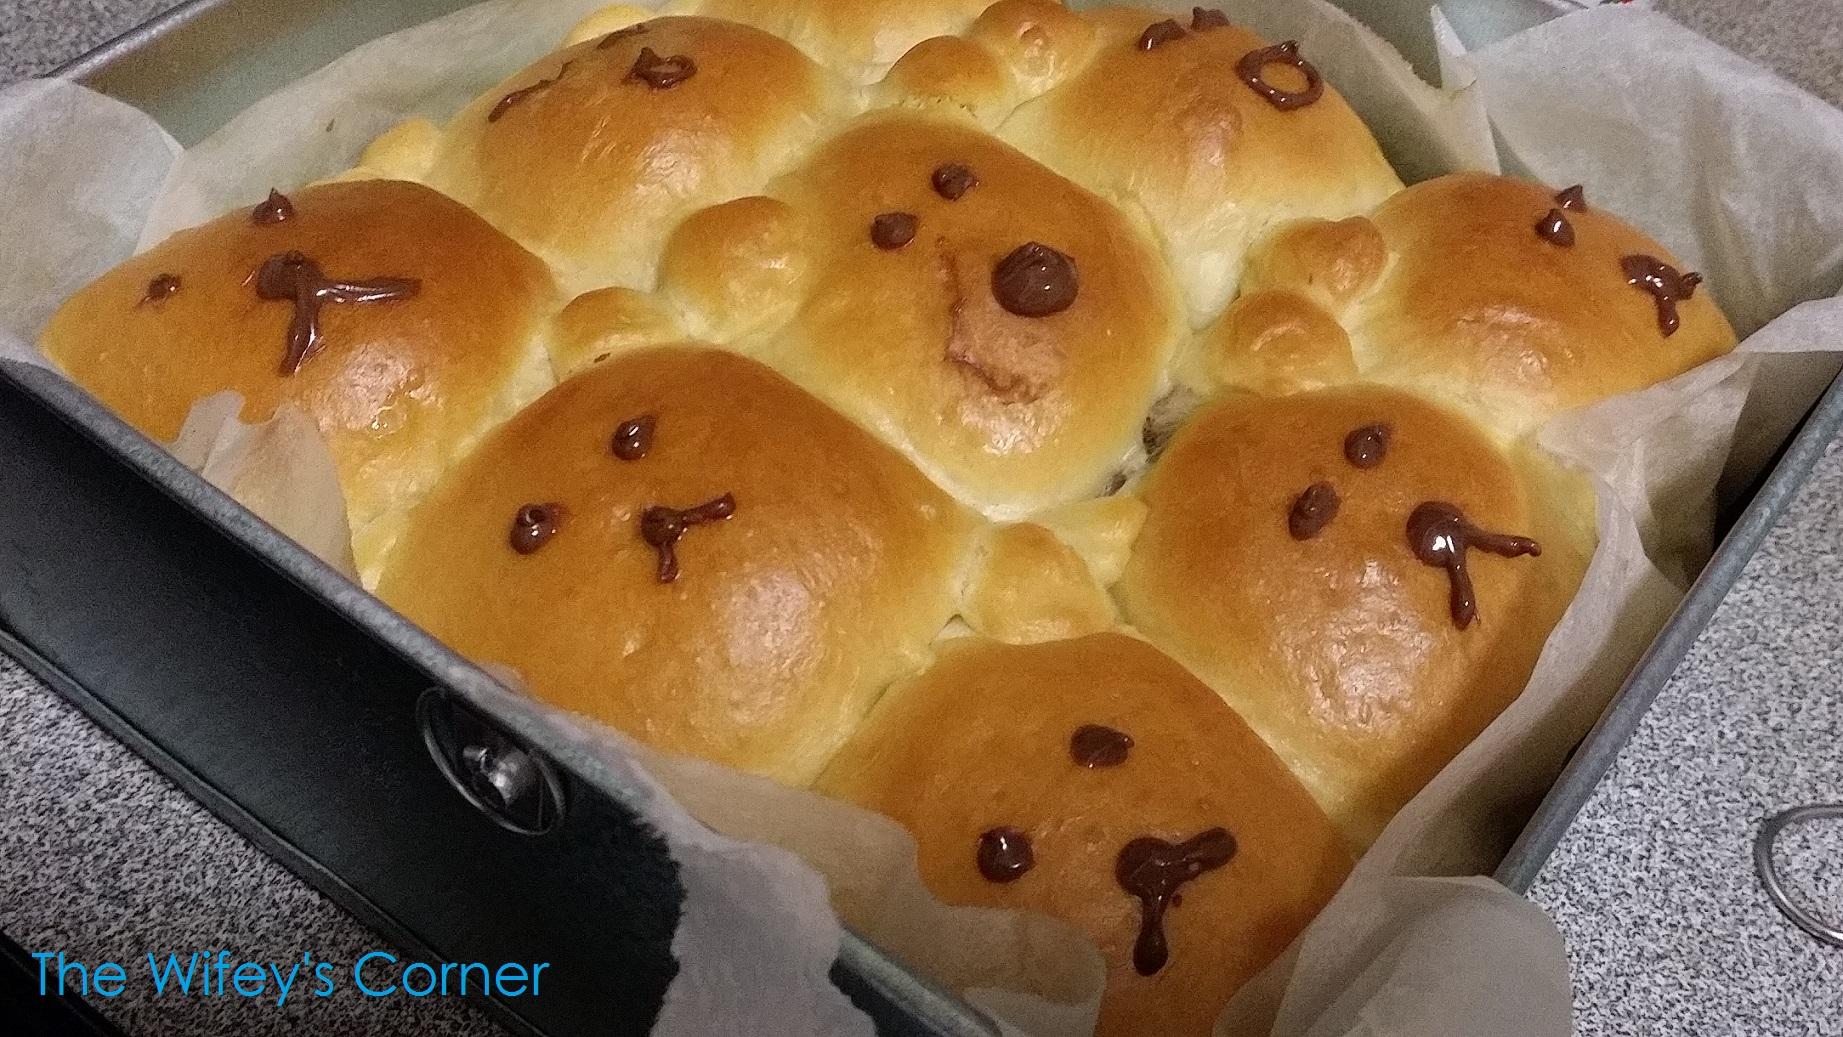 Bear Wannabe (ᵔᴥᵔ) Pull Apart Bread